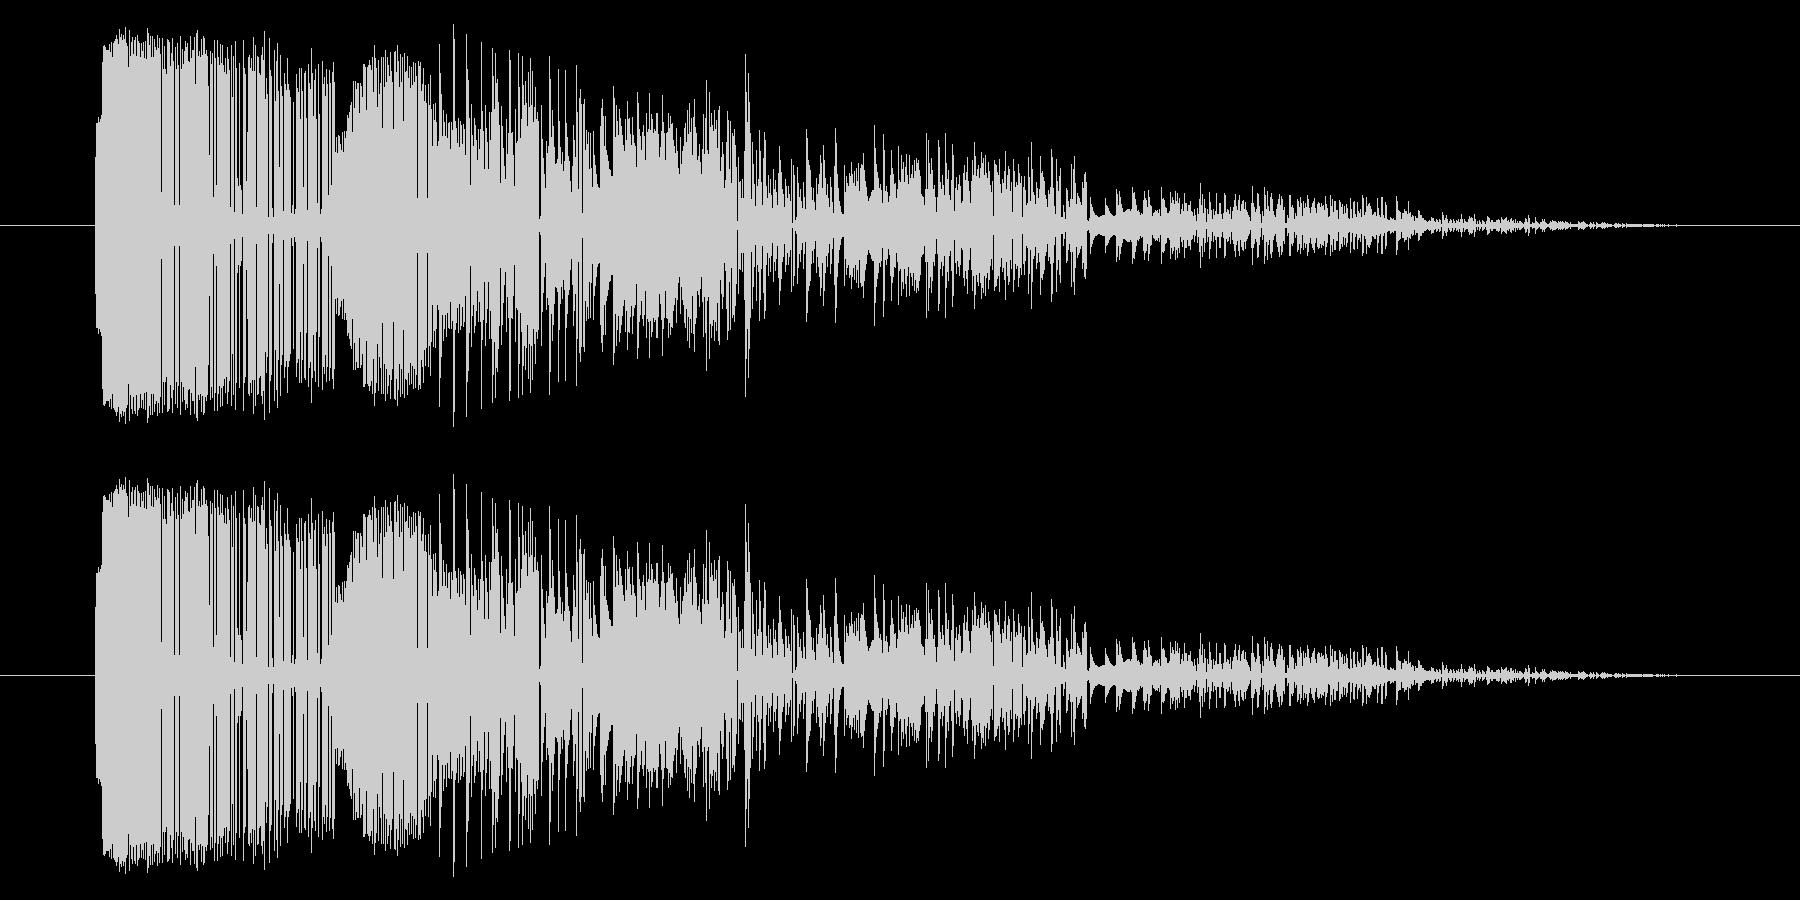 GB シューティング01-06(ミス)の未再生の波形